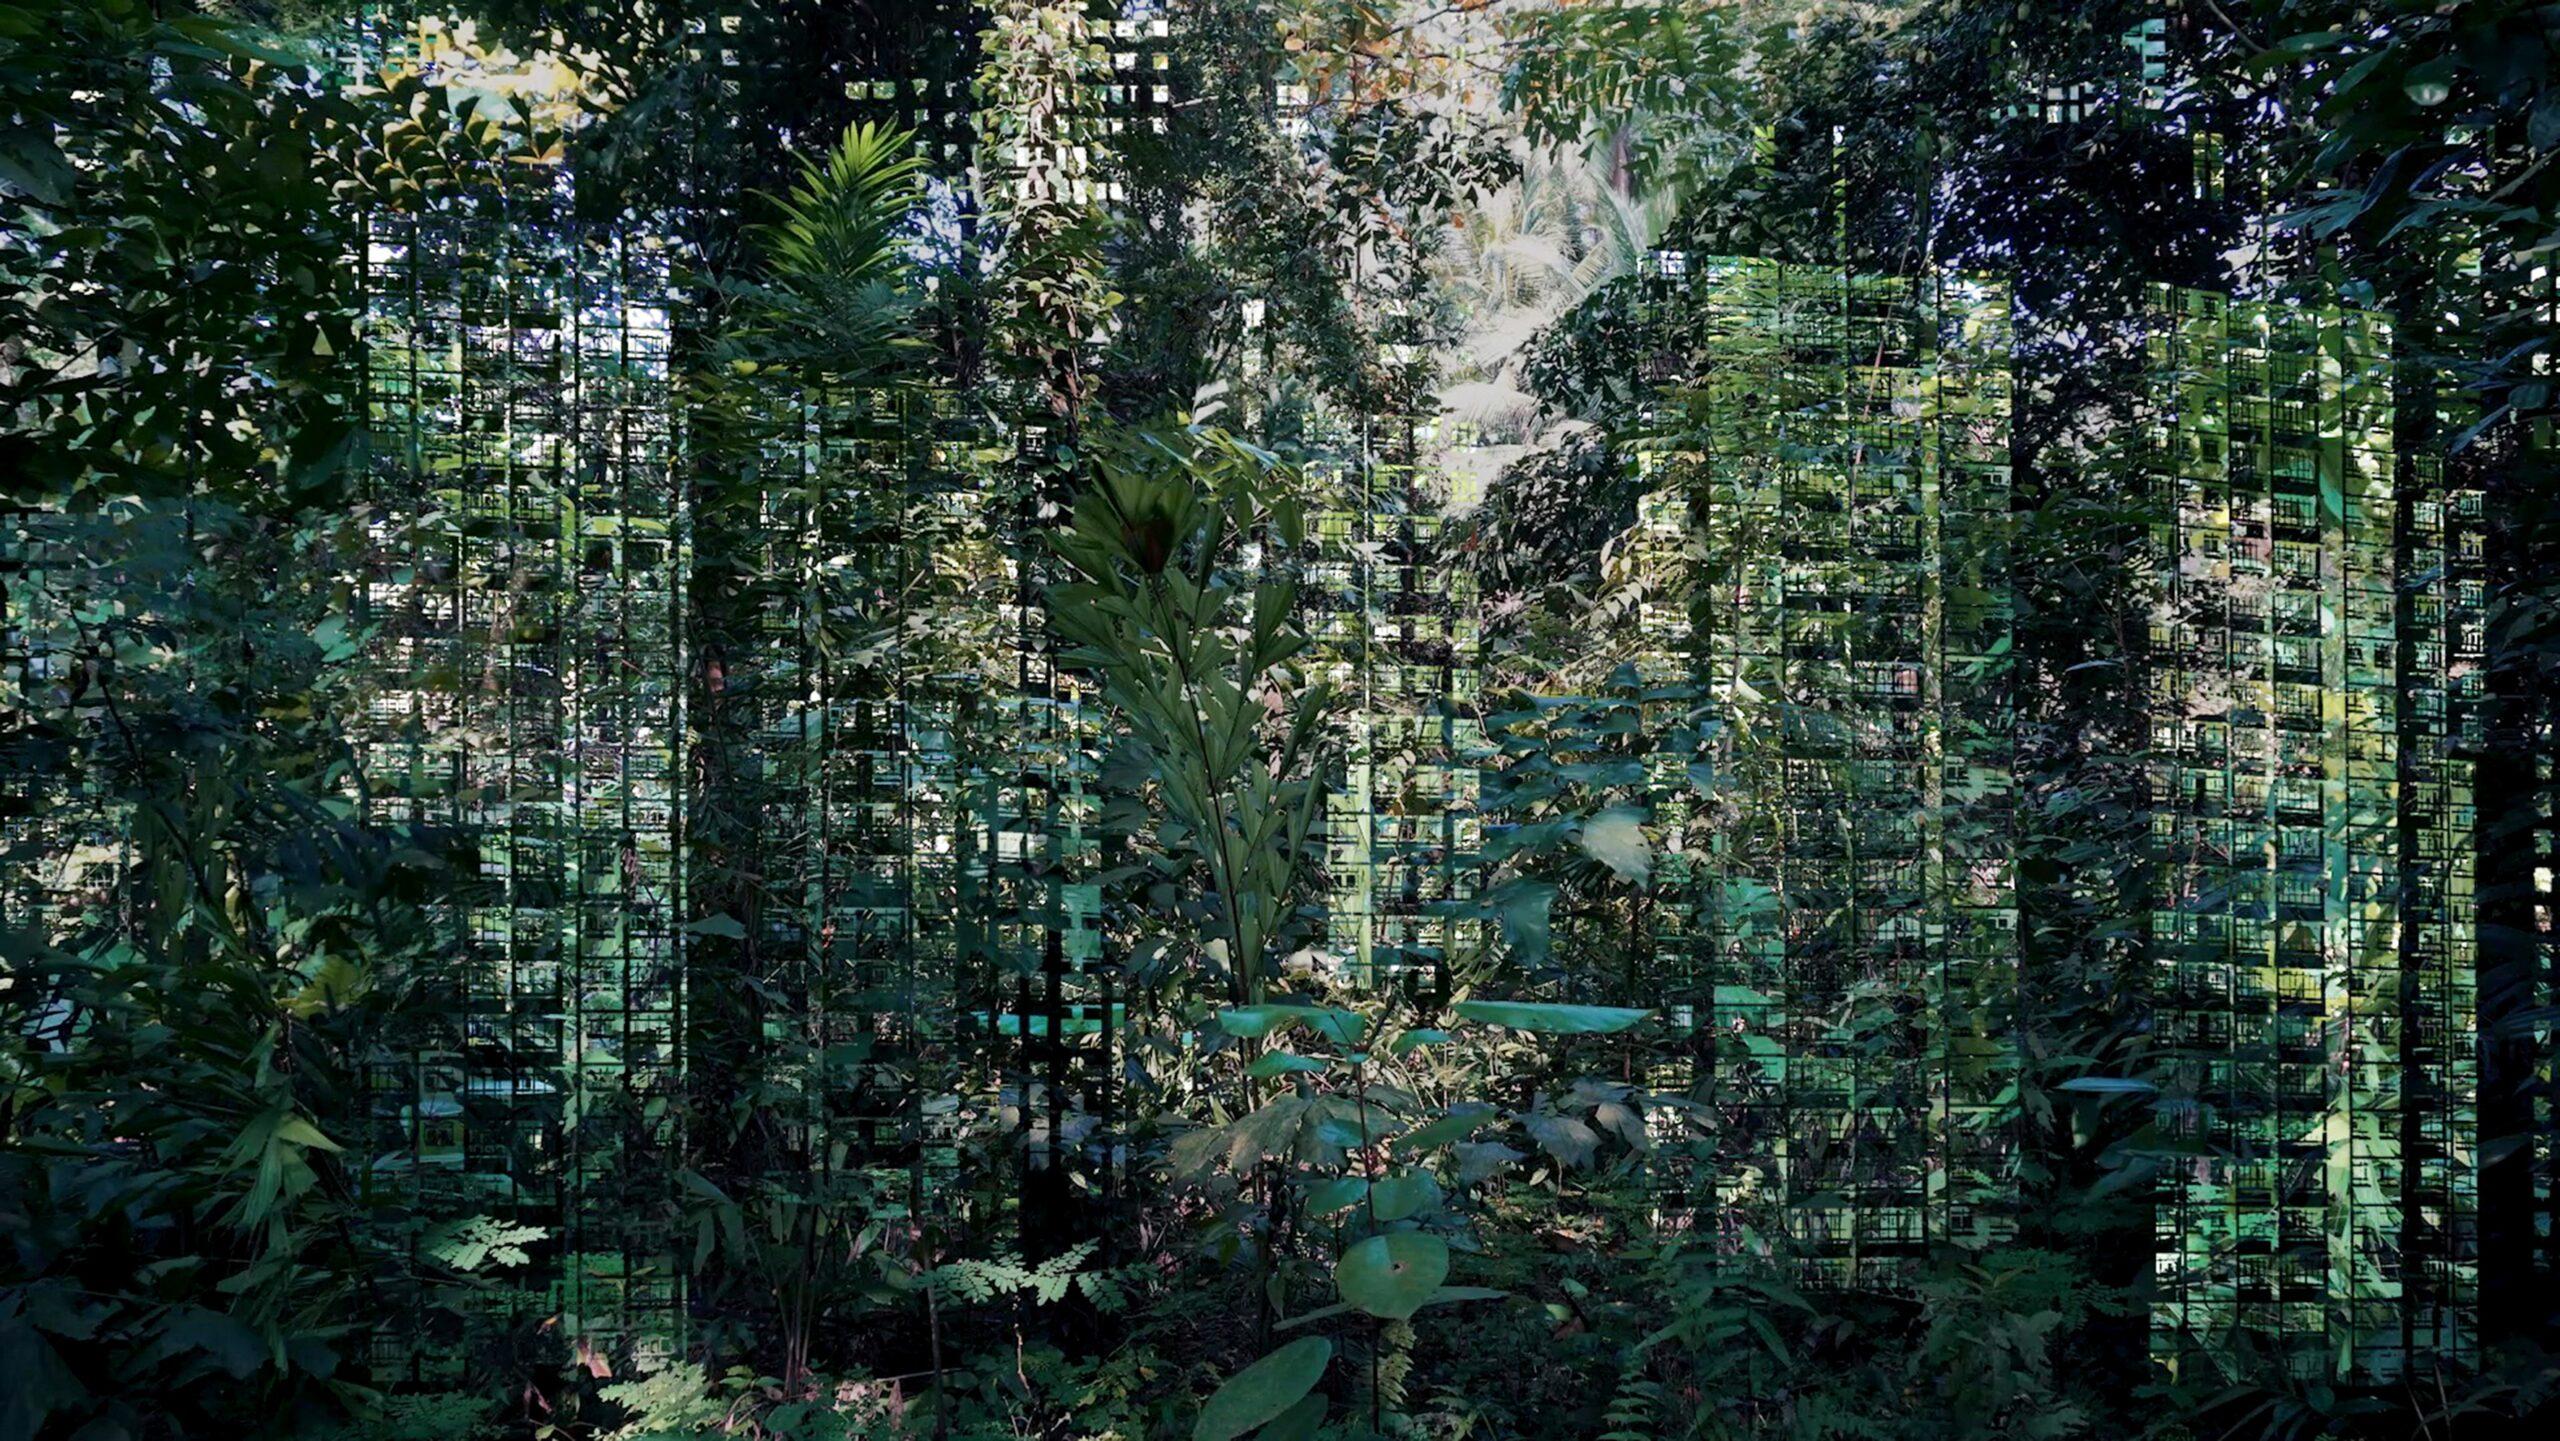 xx_Jäger-Monica-Ursina_Forest-Tales-and-Emerald-Fictions_2019_KHG_21_Im-Wald